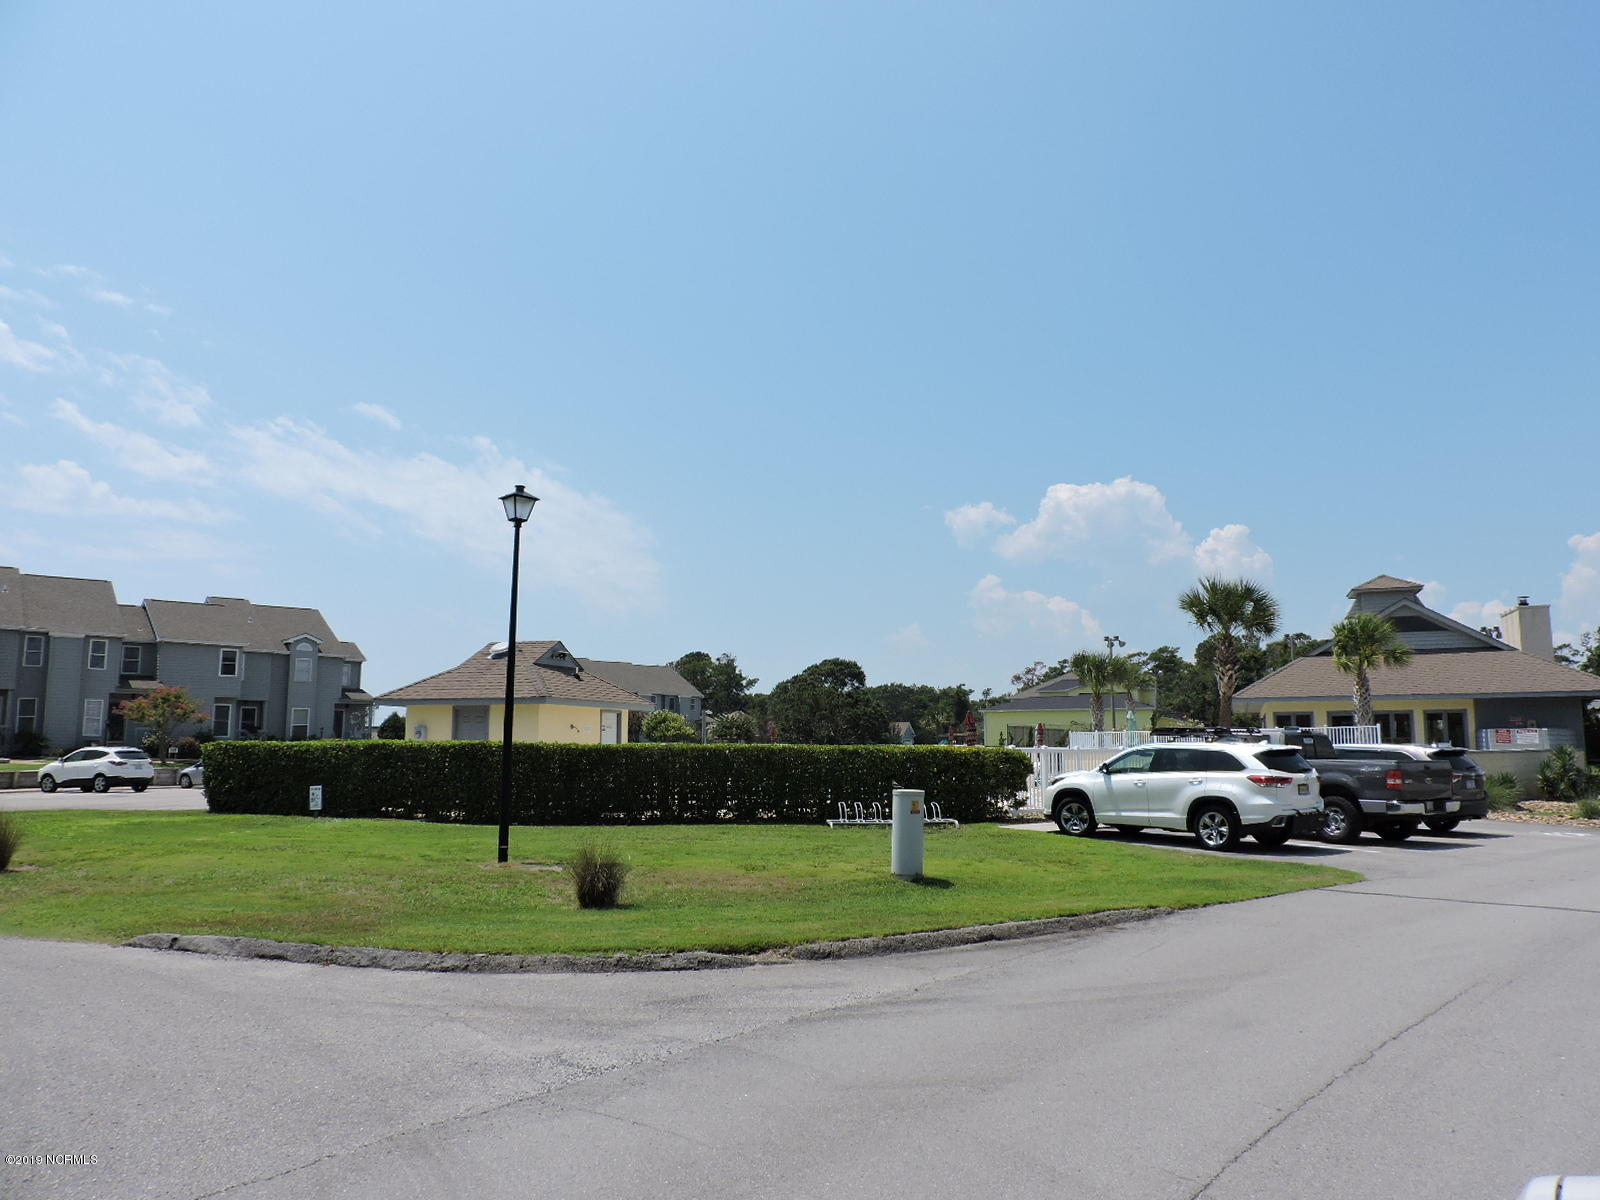 8716 Emerald Plantation Rd, Emerald Isle, North Carolina 28594, ,Residential land,For sale,Emerald Plantation Rd,100179535